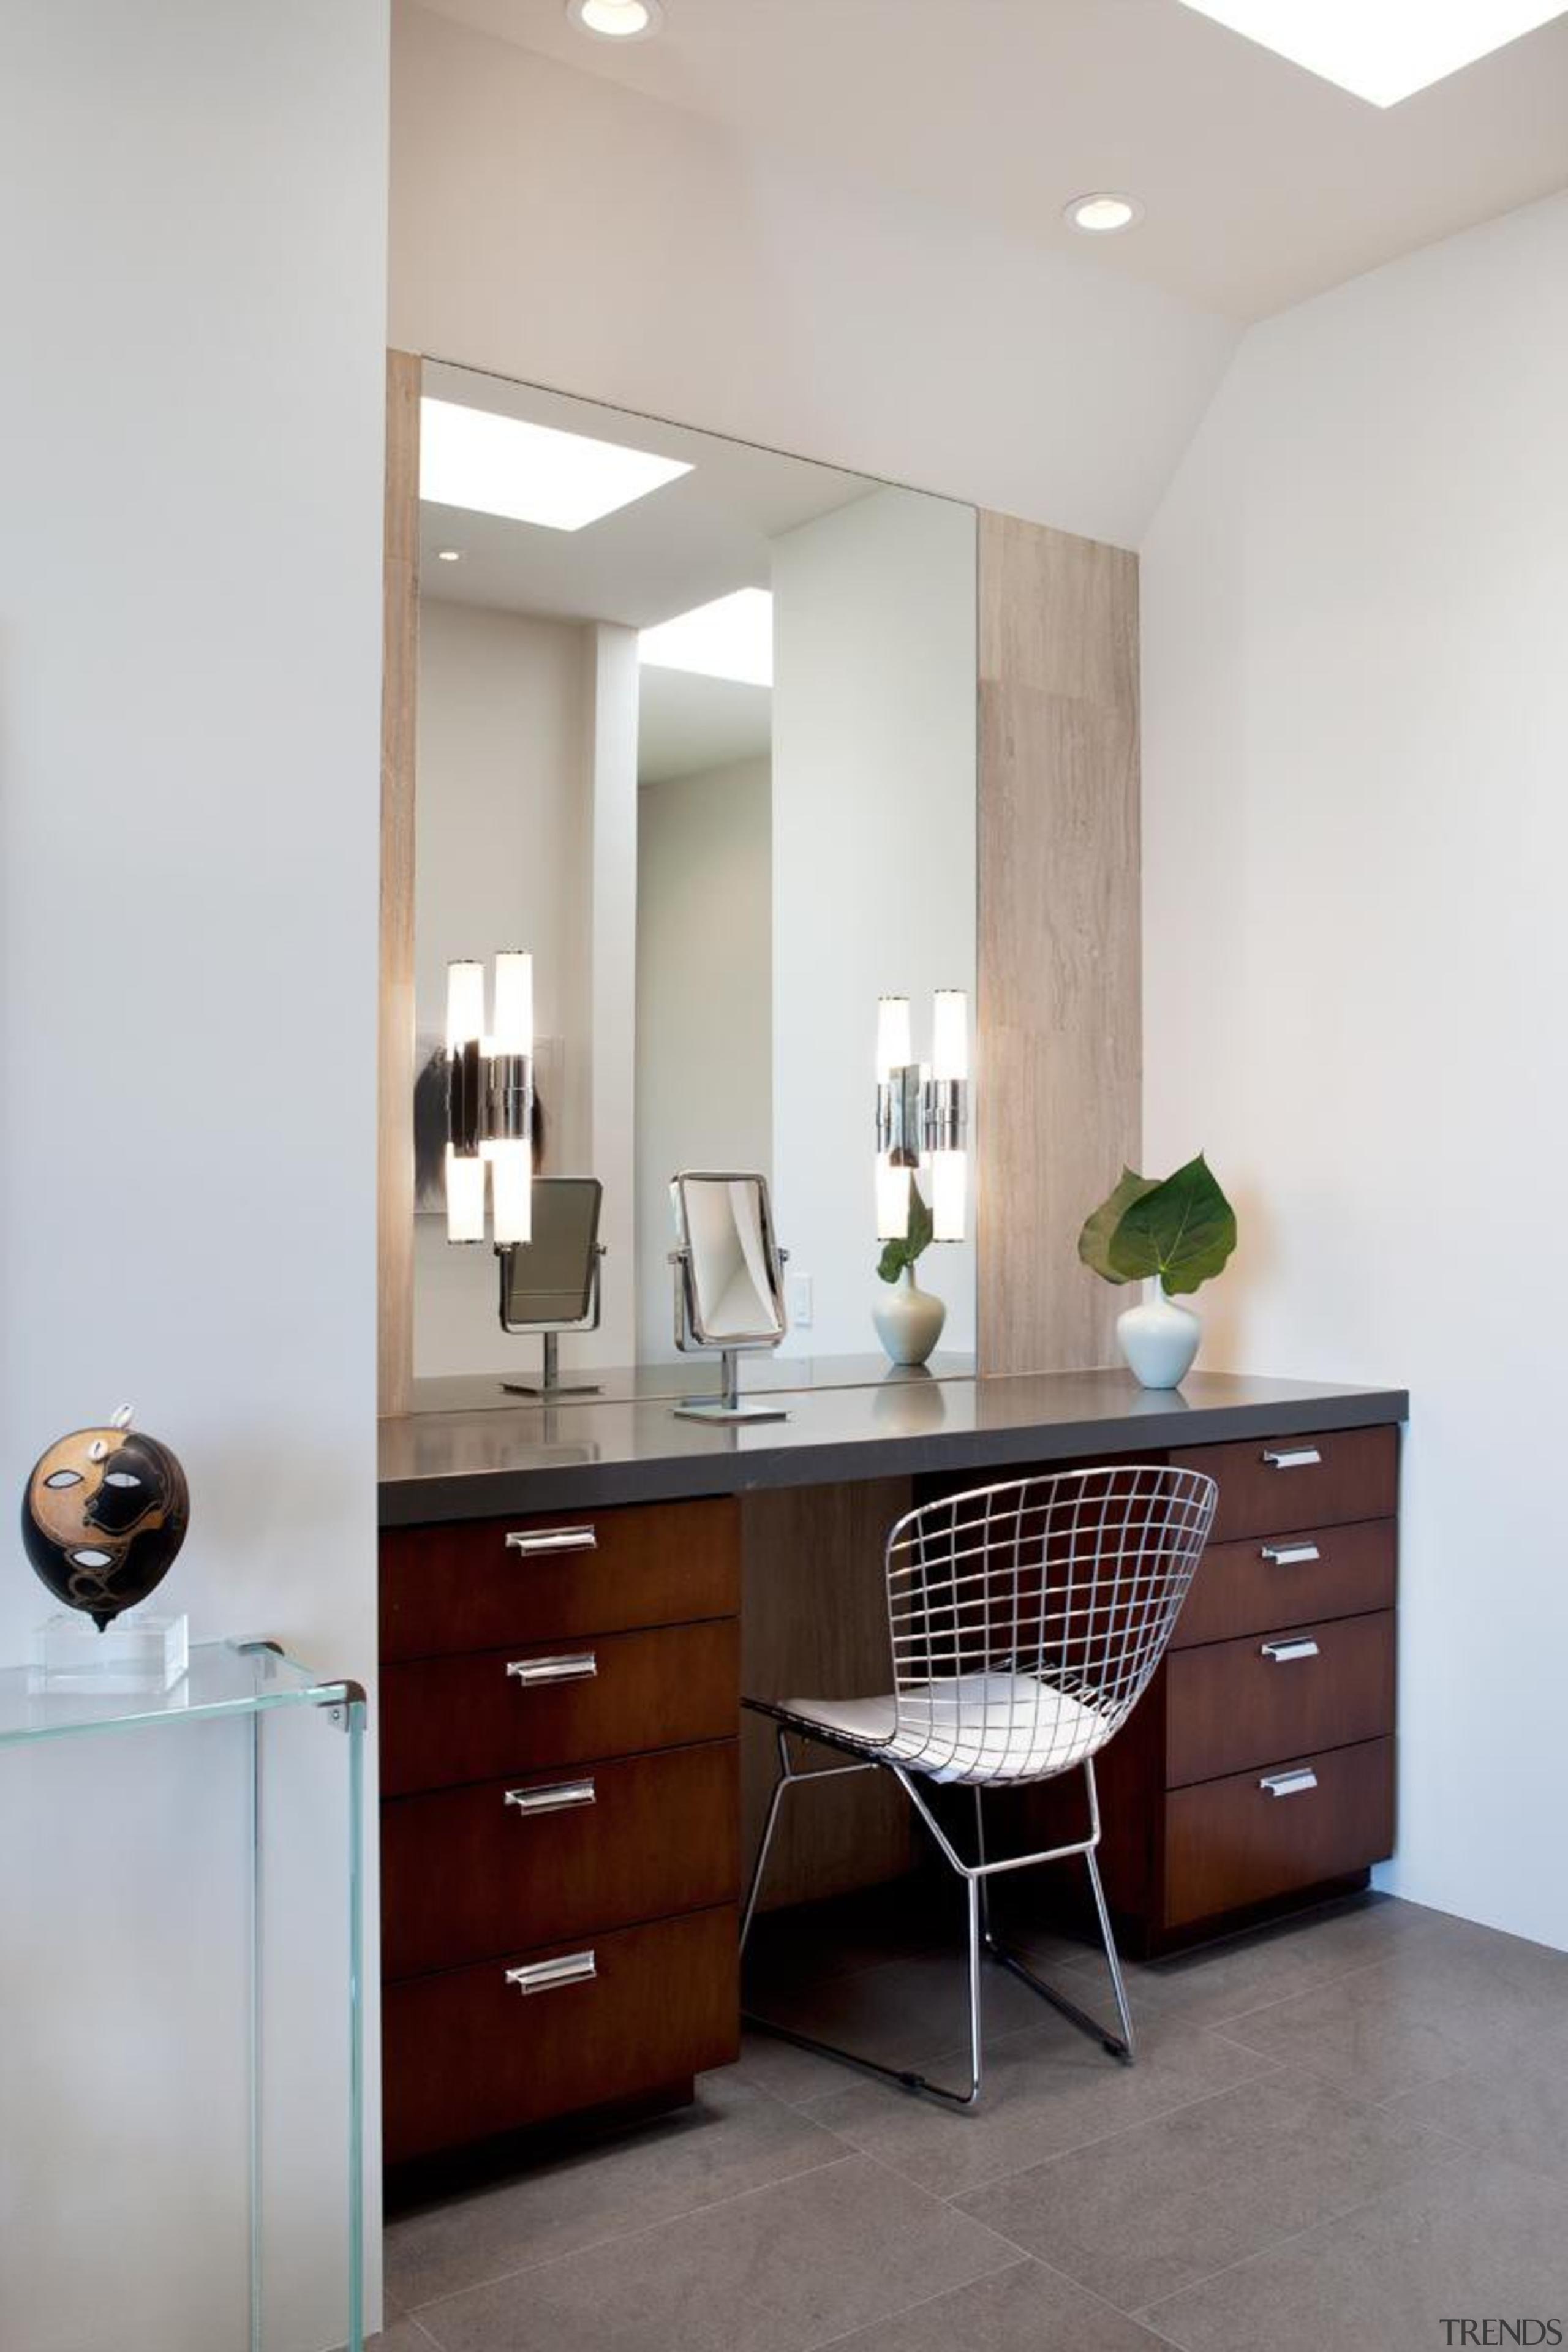 Makeup Vanity - Makeup Vanity - bathroom | bathroom, bathroom accessory, bathroom cabinet, cabinetry, chest of drawers, floor, furniture, home, interior design, product design, room, table, wall, gray